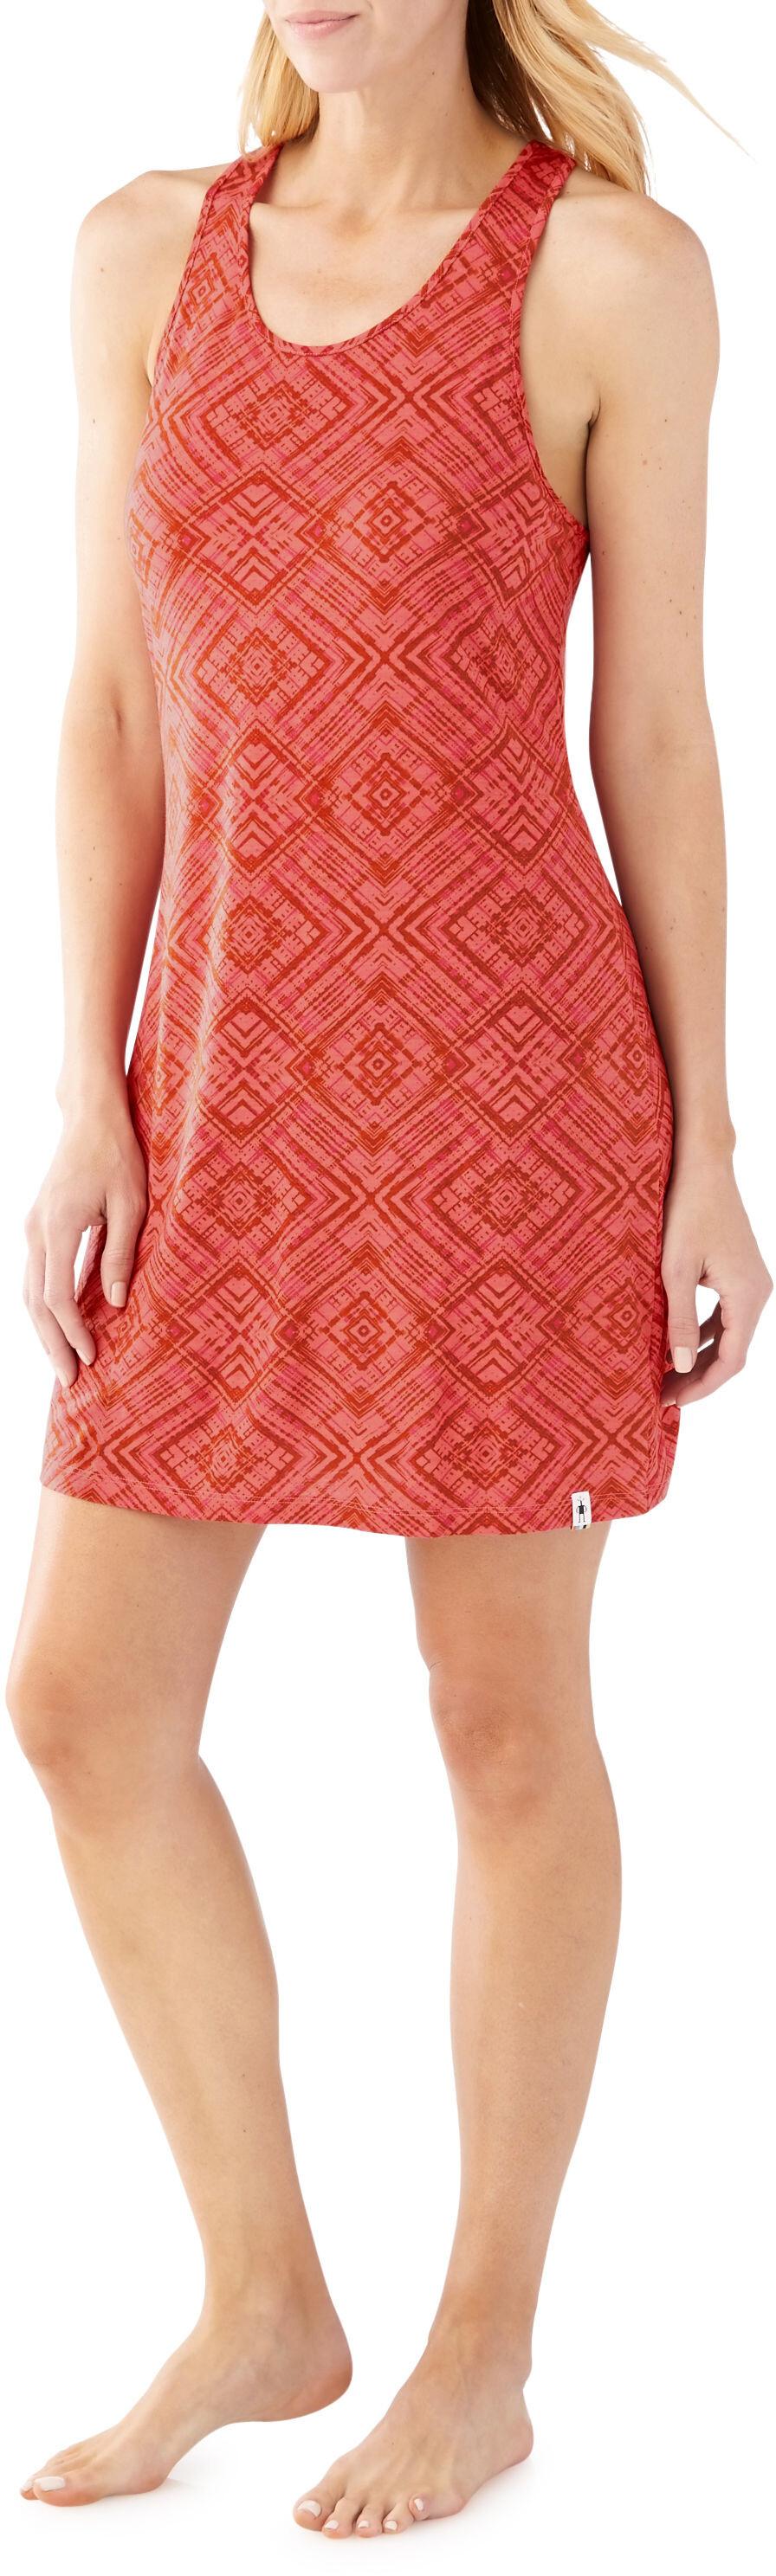 29267e8de17 Smartwool Basic Merino 150 Pattern - Robe Femme - rouge sur CAMPZ !